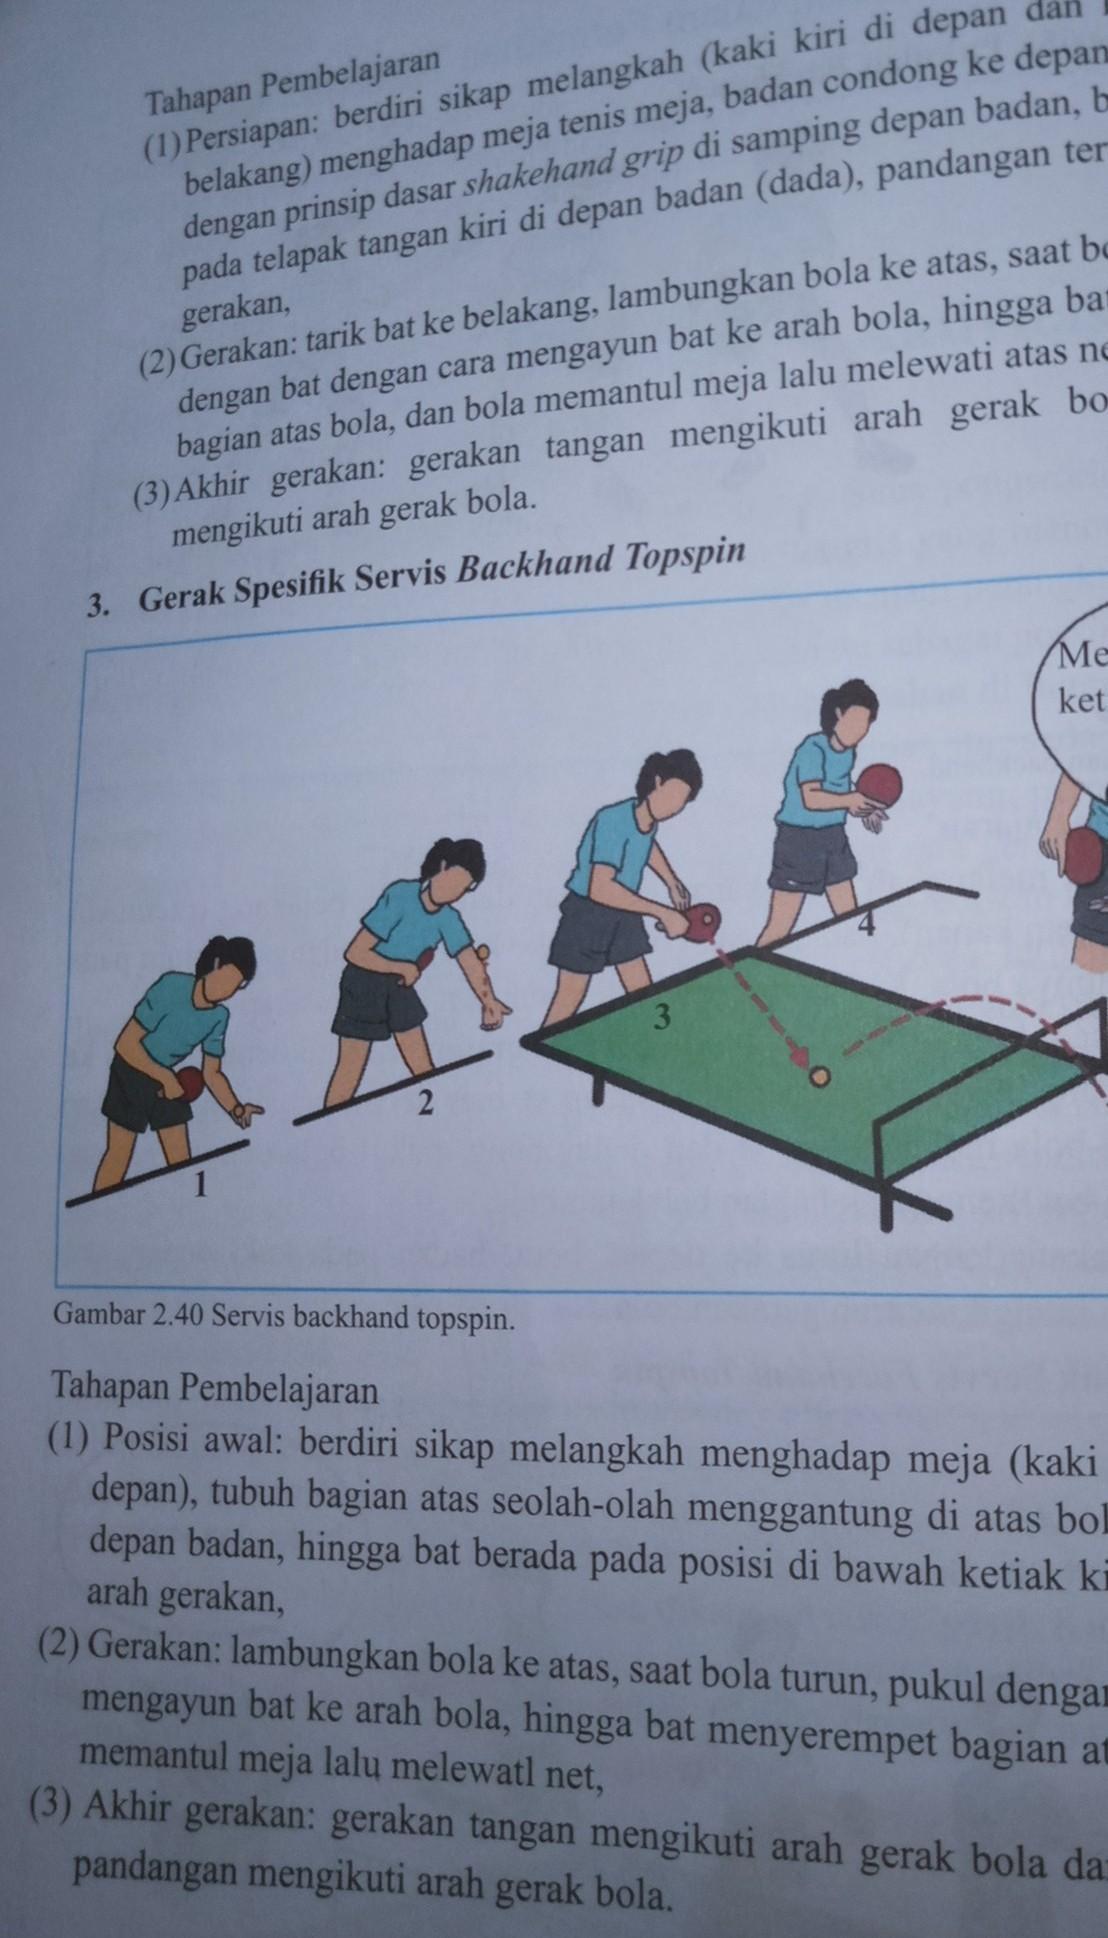 Perkenaan Bet Pada Bola Saat Melakukan Pukulan Backhand Topspin : perkenaan, melakukan, pukulan, backhand, topspin, Melakukan, Servis, Forehand, Topspin, Diletakkan